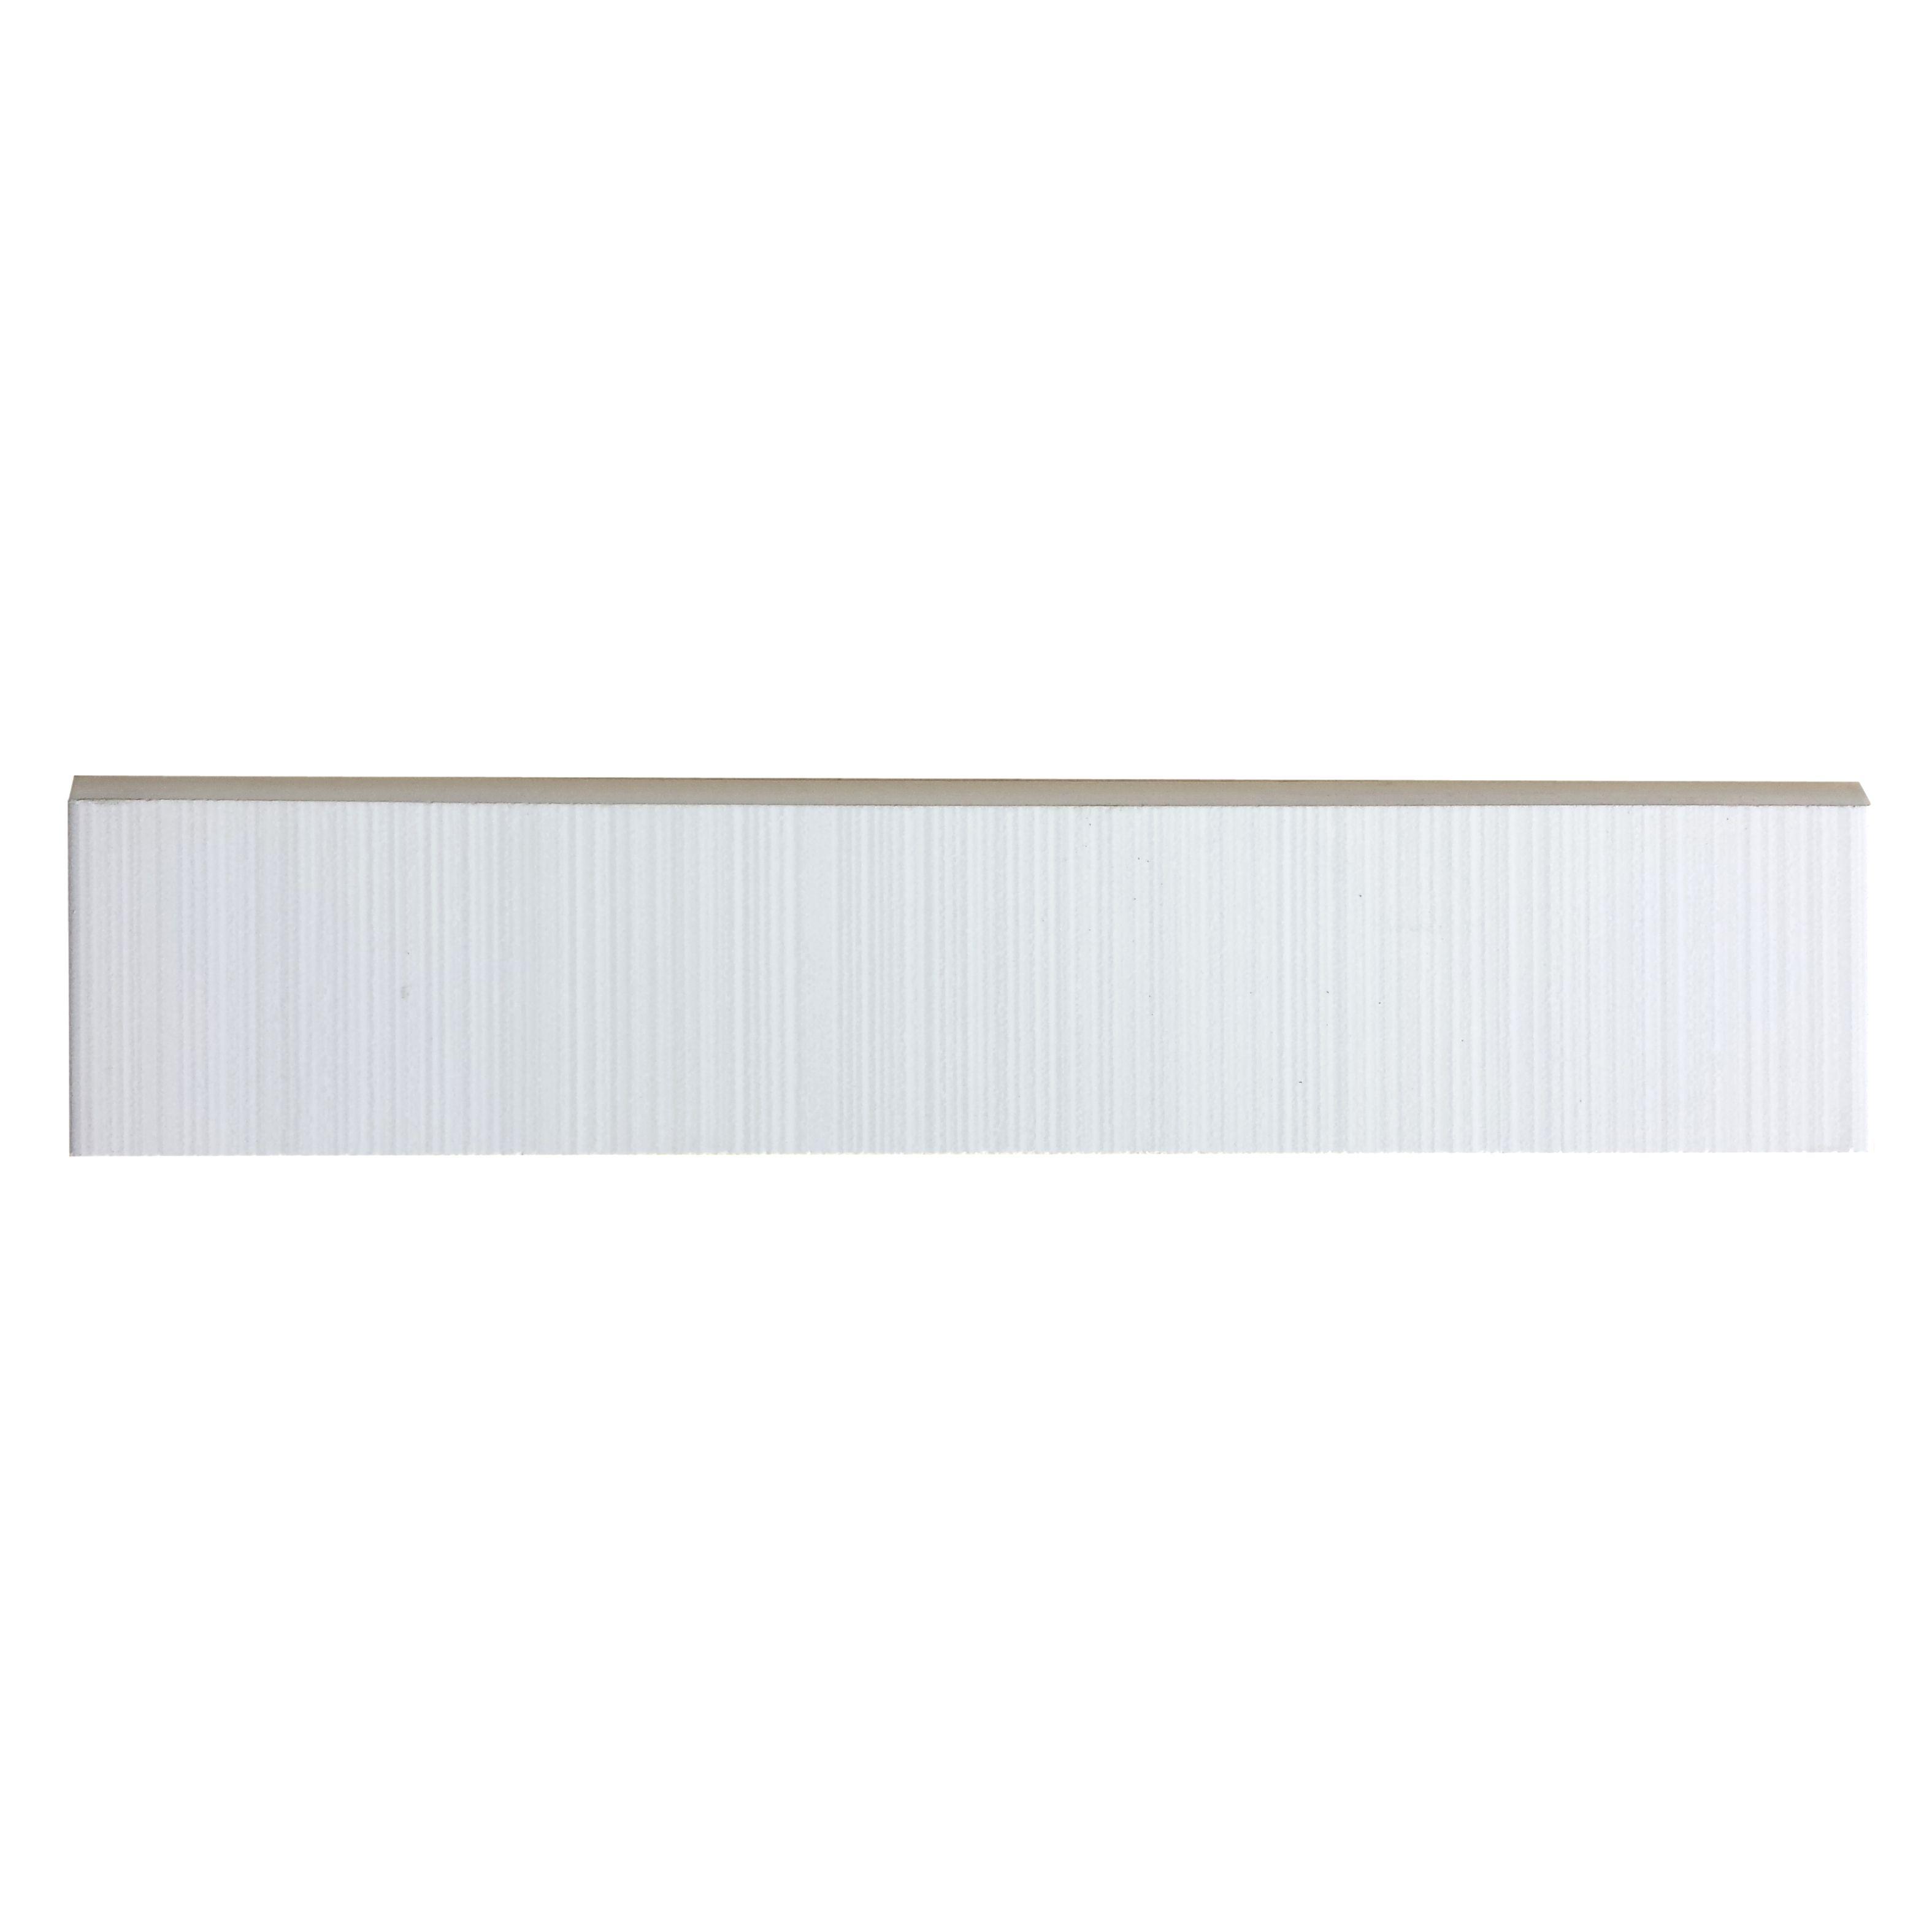 Blairlock White Bullnose Tile | Blairlock White Collection ...